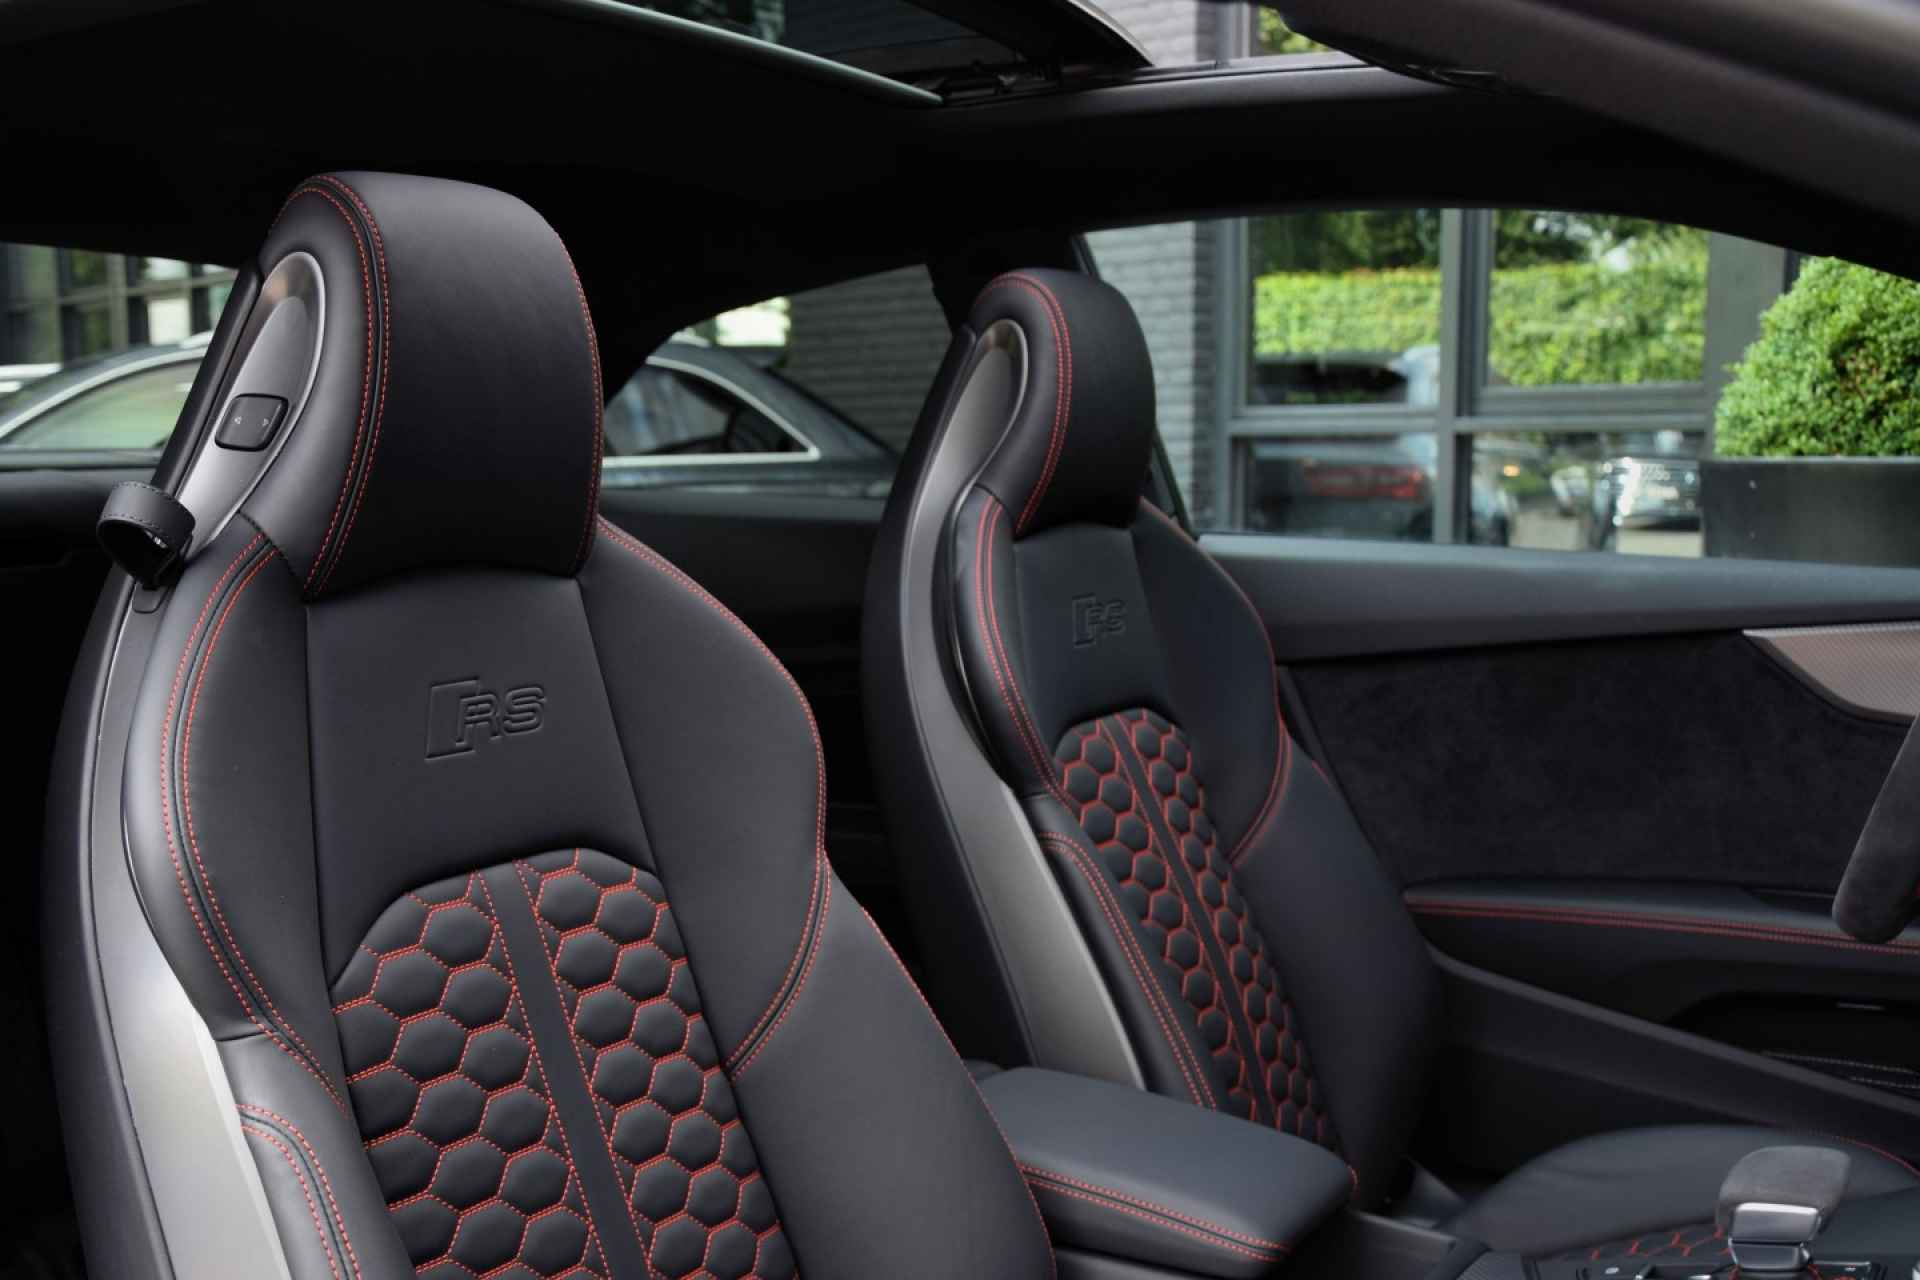 Tweedehands Audi RS5 Coupé occasion